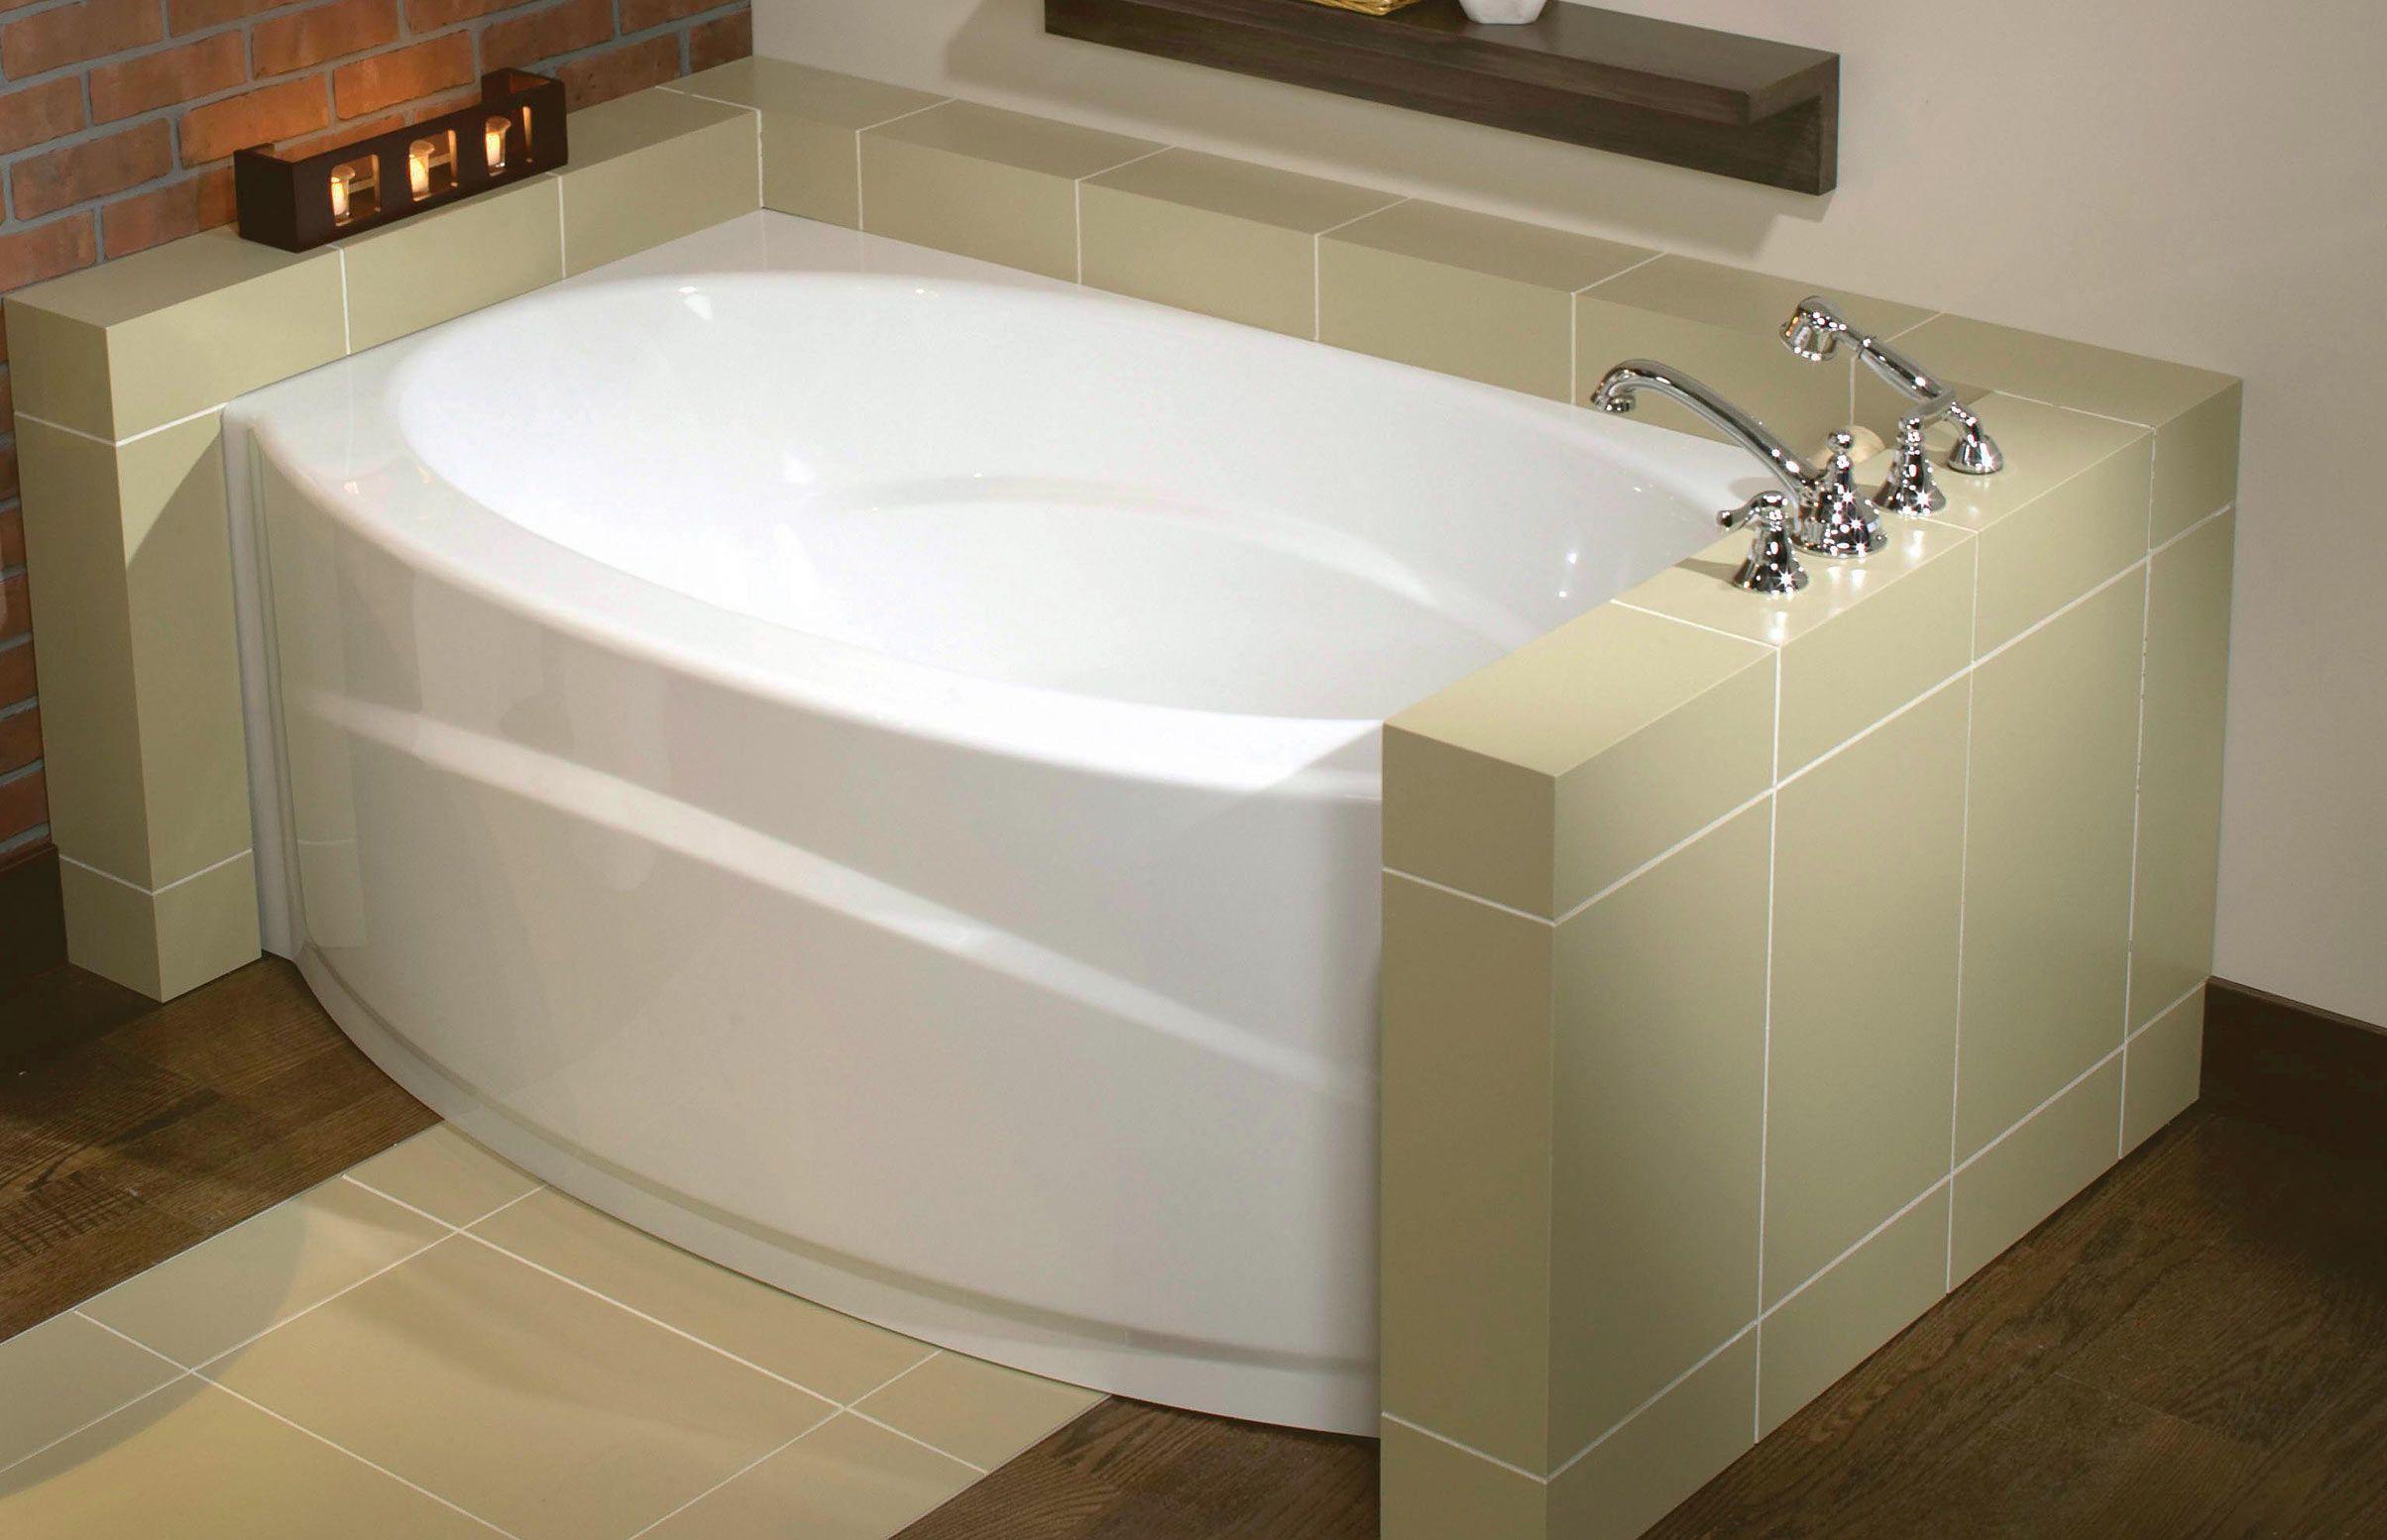 ISLANDER Alcove bathtub - MAAX Professional | Bathroom ideas ...